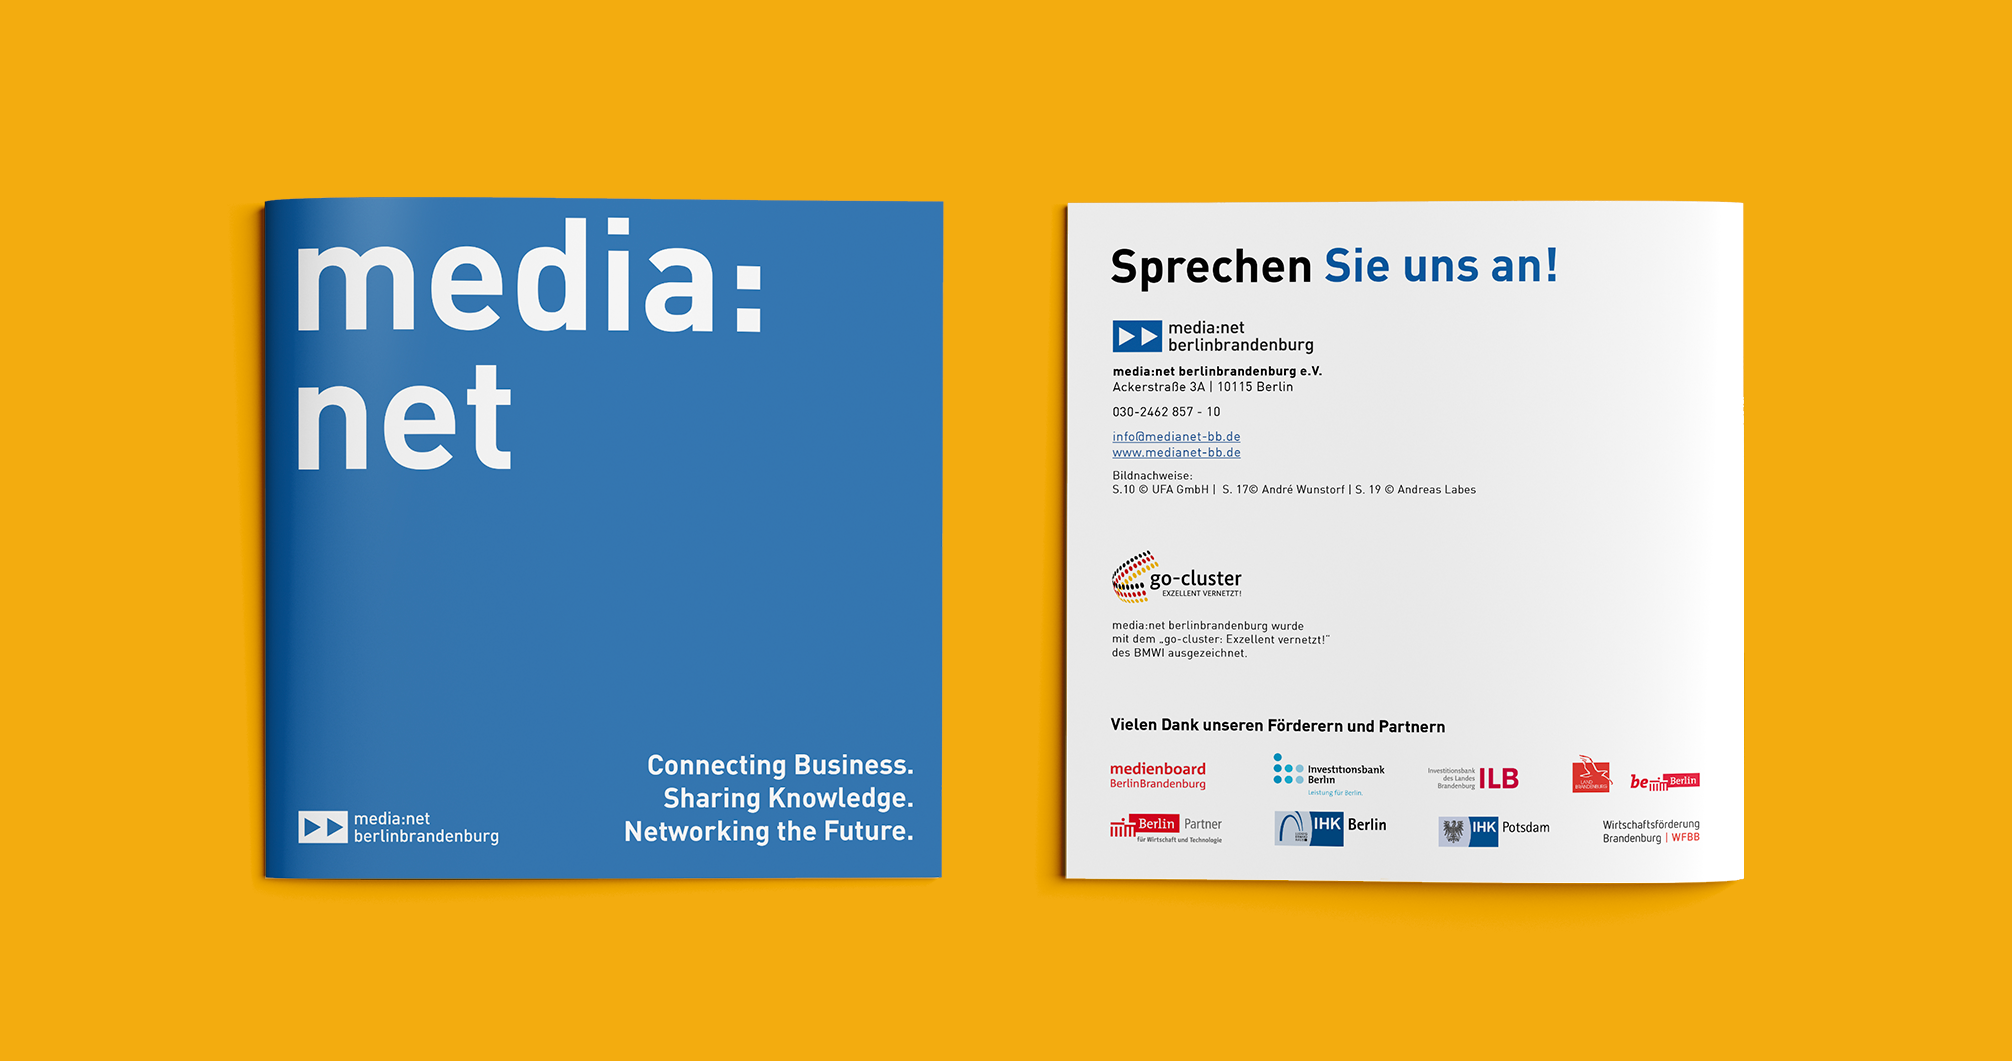 Media net berlinbrandenburg Image Broschüre | Redesign Corporate Design - Cover